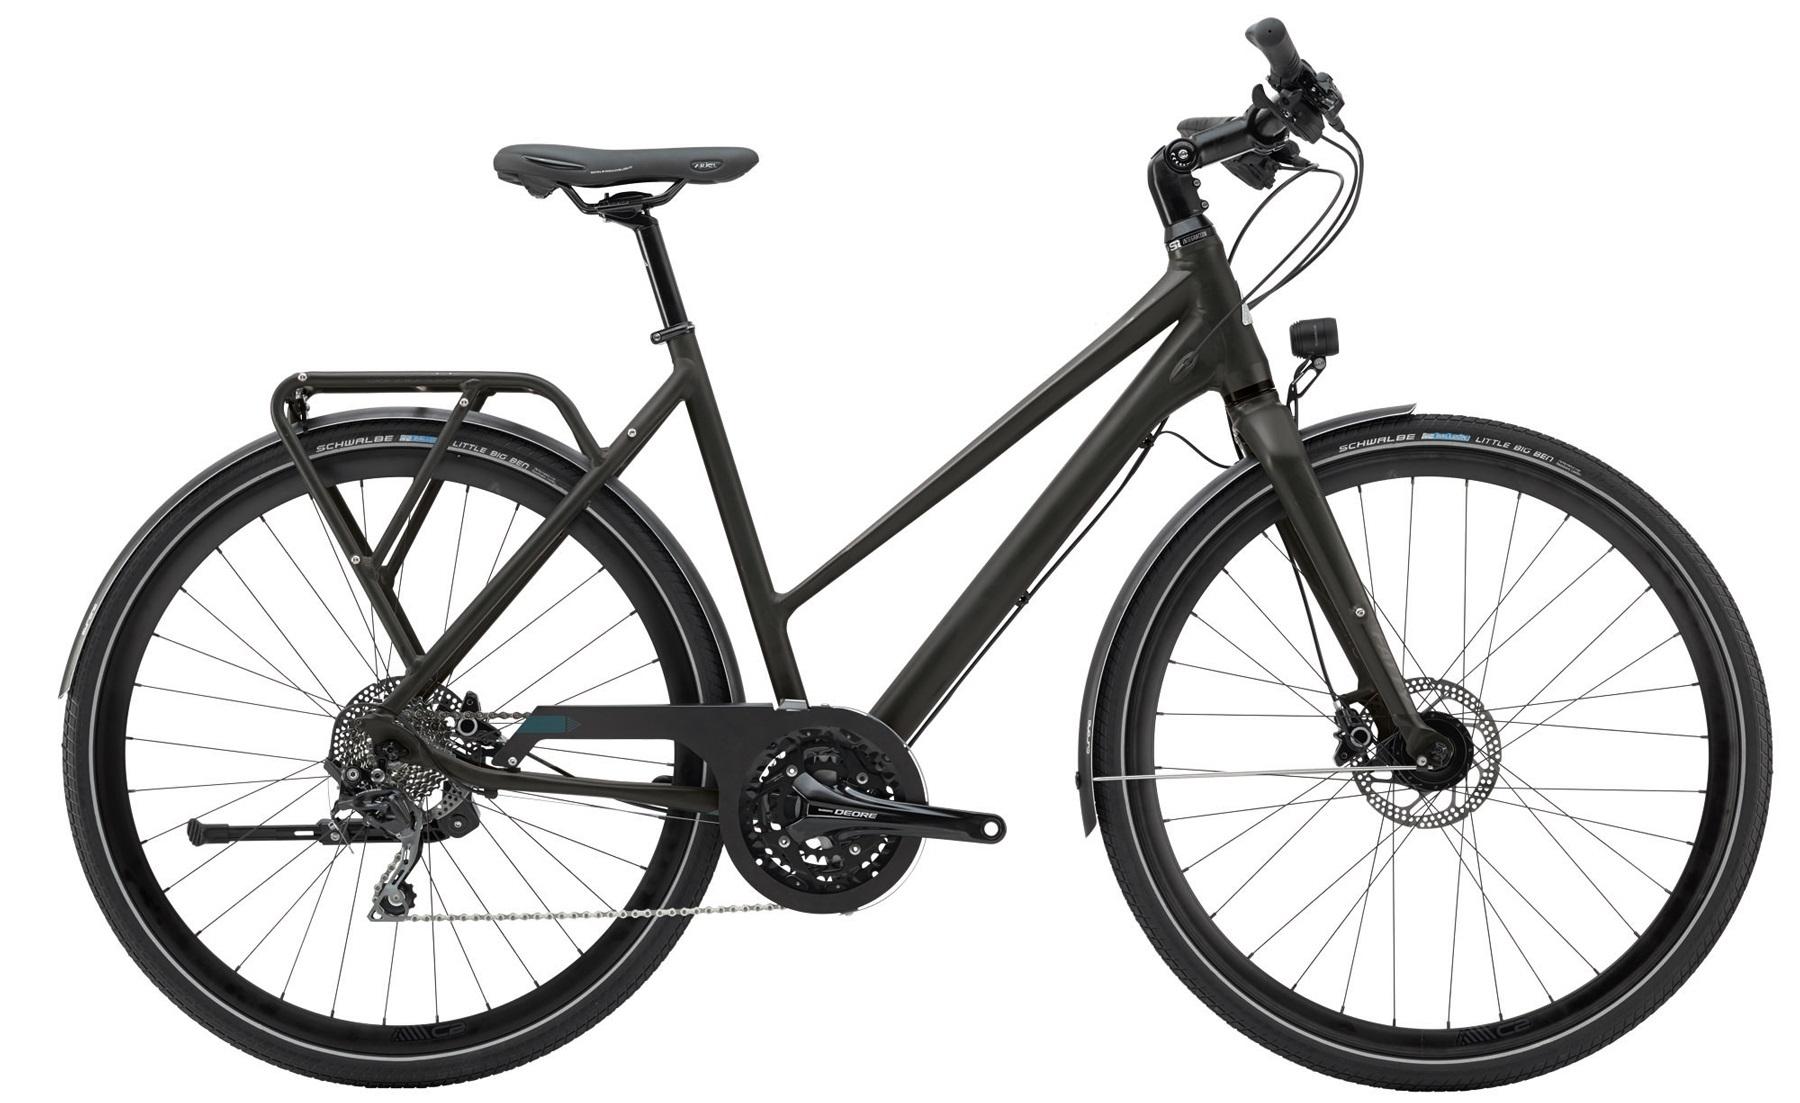 Vélo urbain / trekking Cannondale Tesoro Mixte 2 Noir - 48